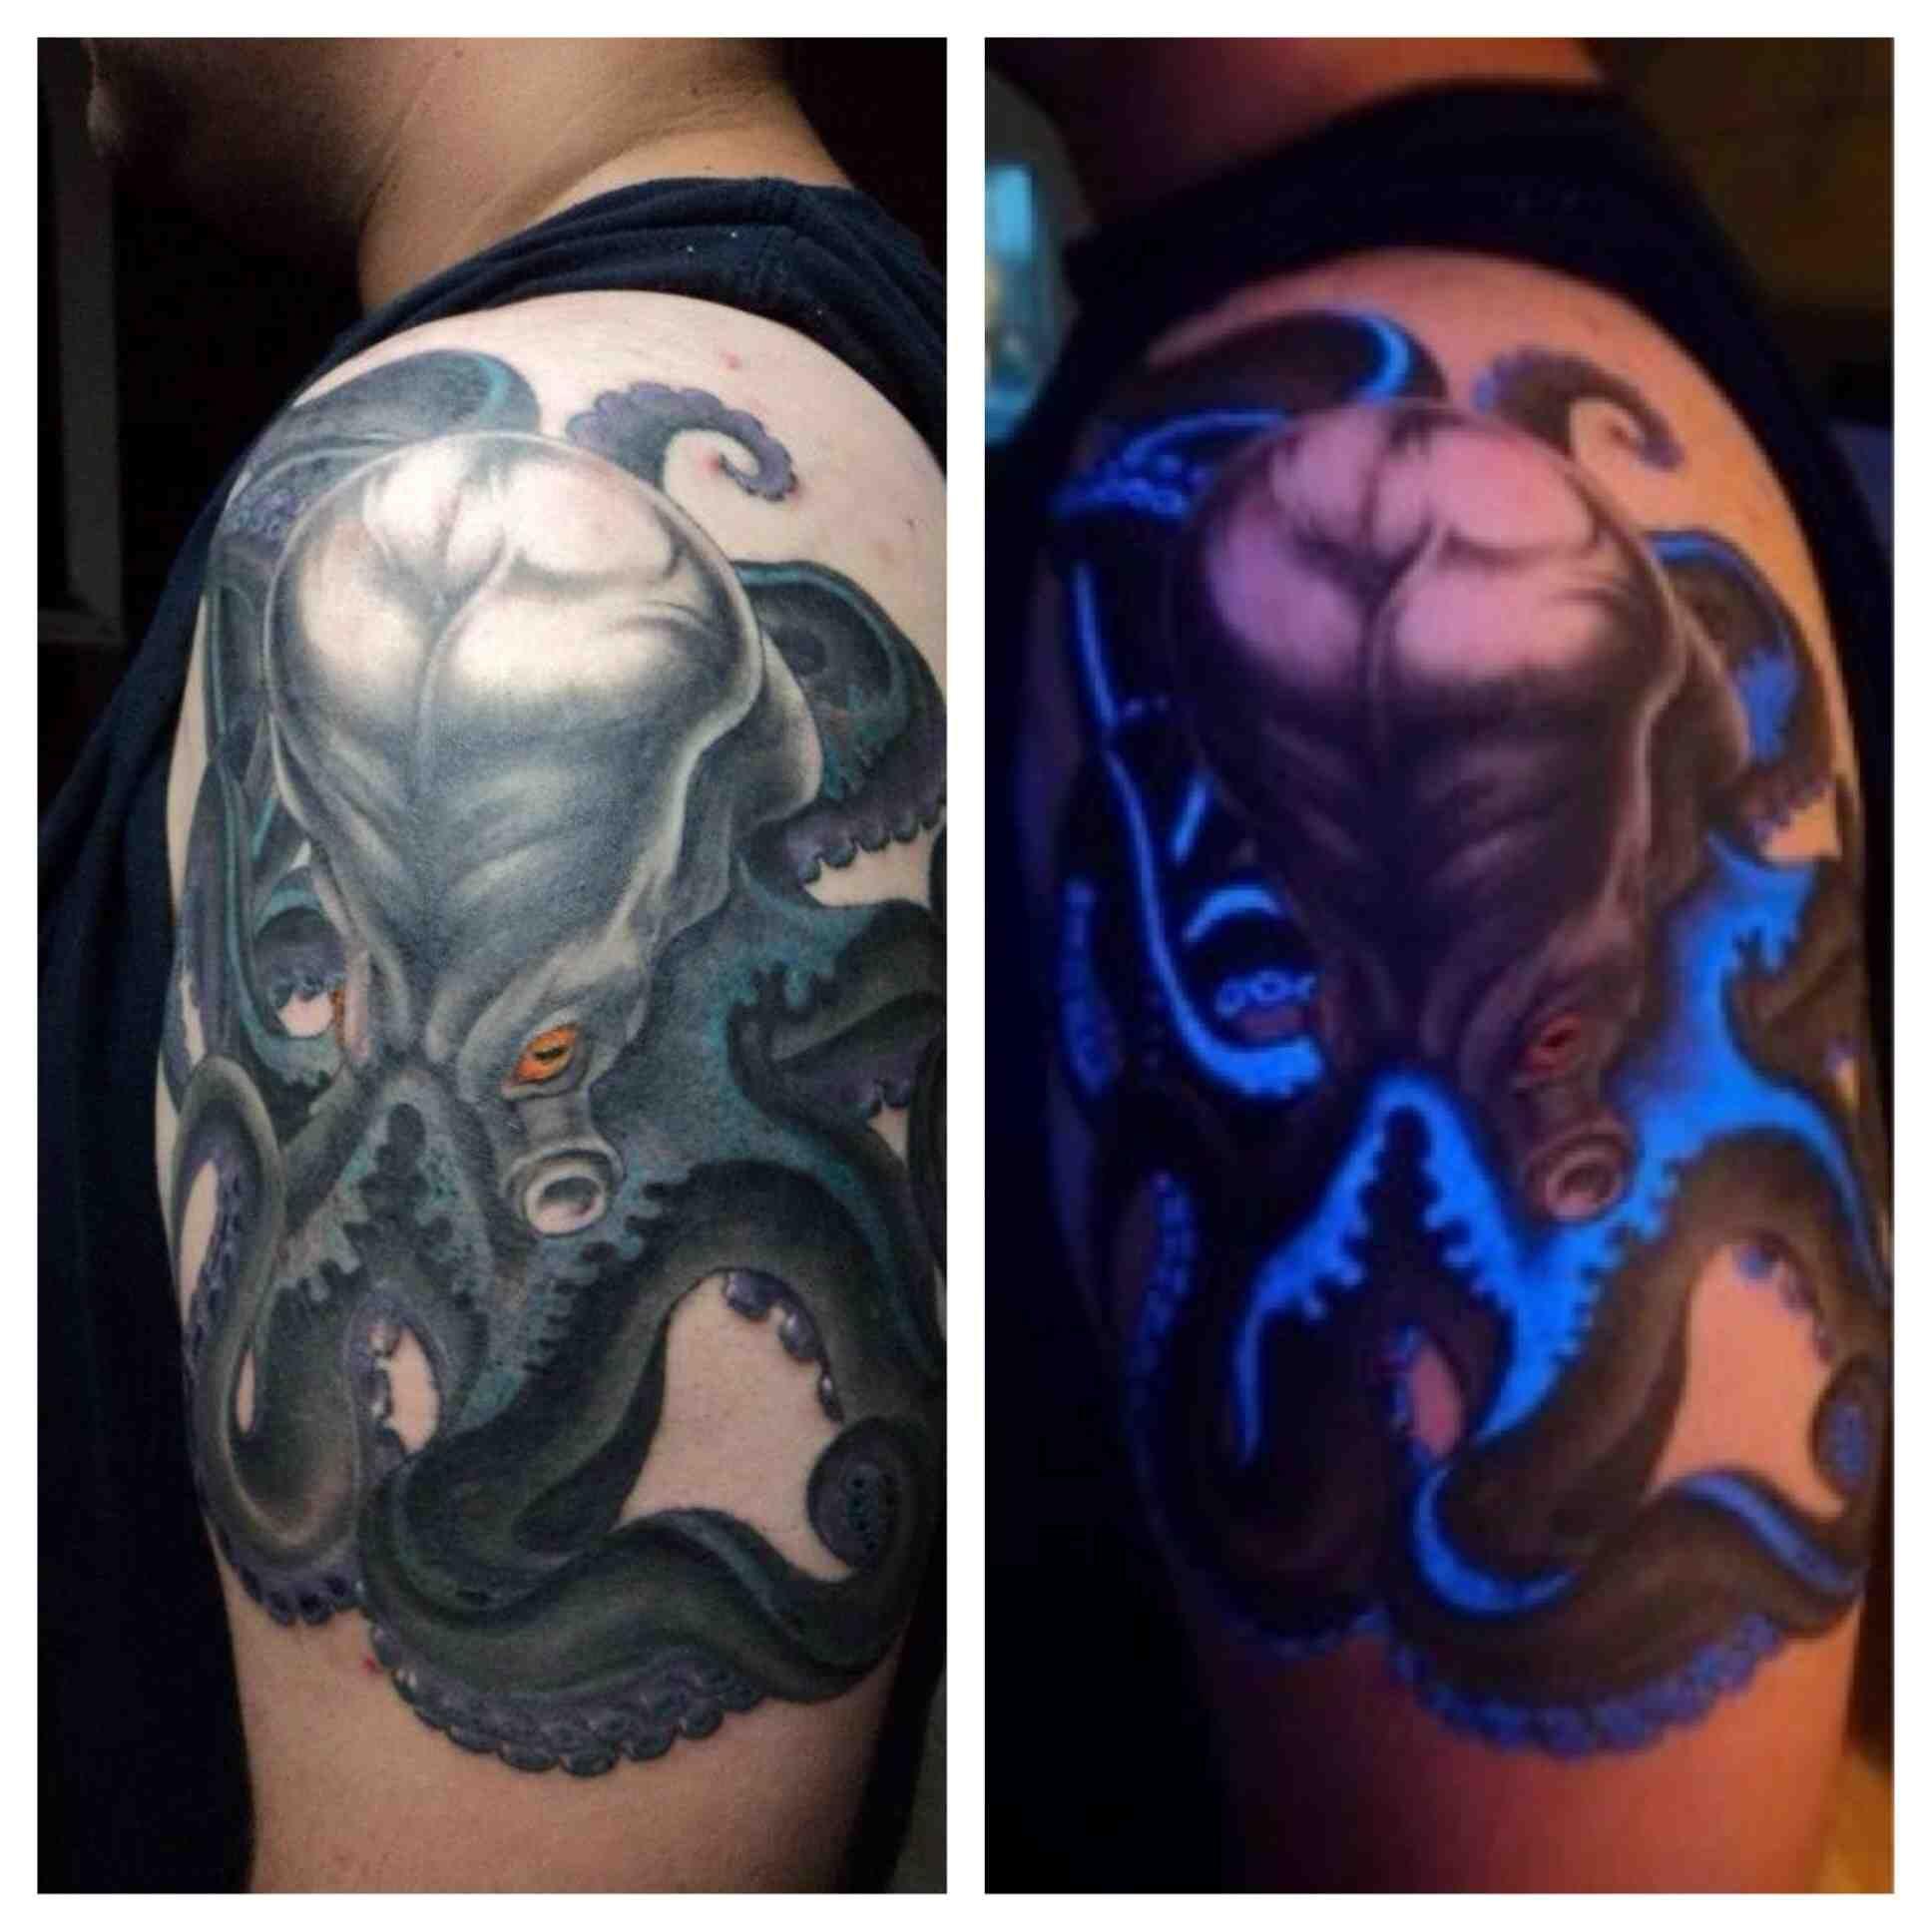 Light uv tattoos henna tattoo for - Uv Tattoo Idea 2016